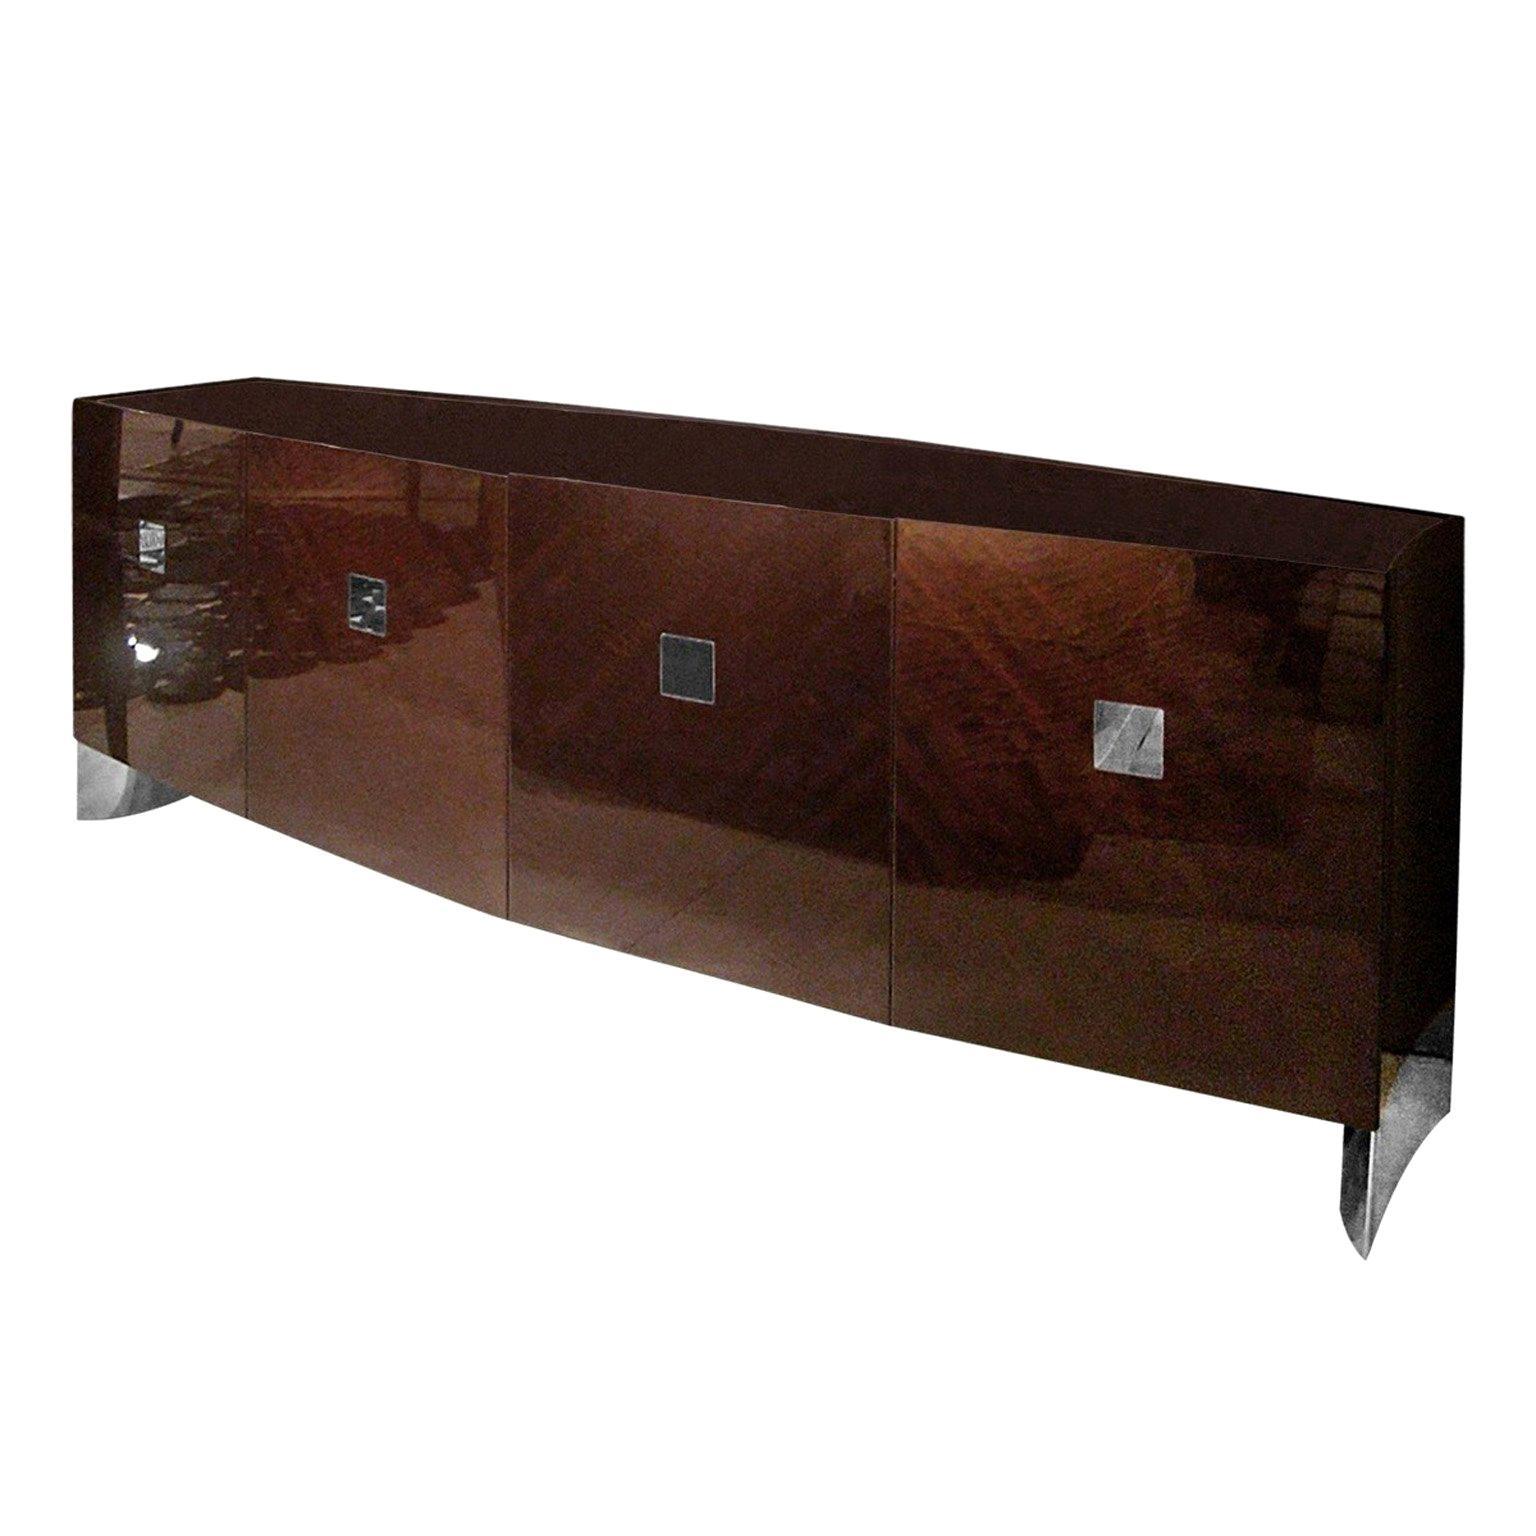 Giorgio Collection Eucalyptus Wood Buffet Side Board in High Gloss Finish